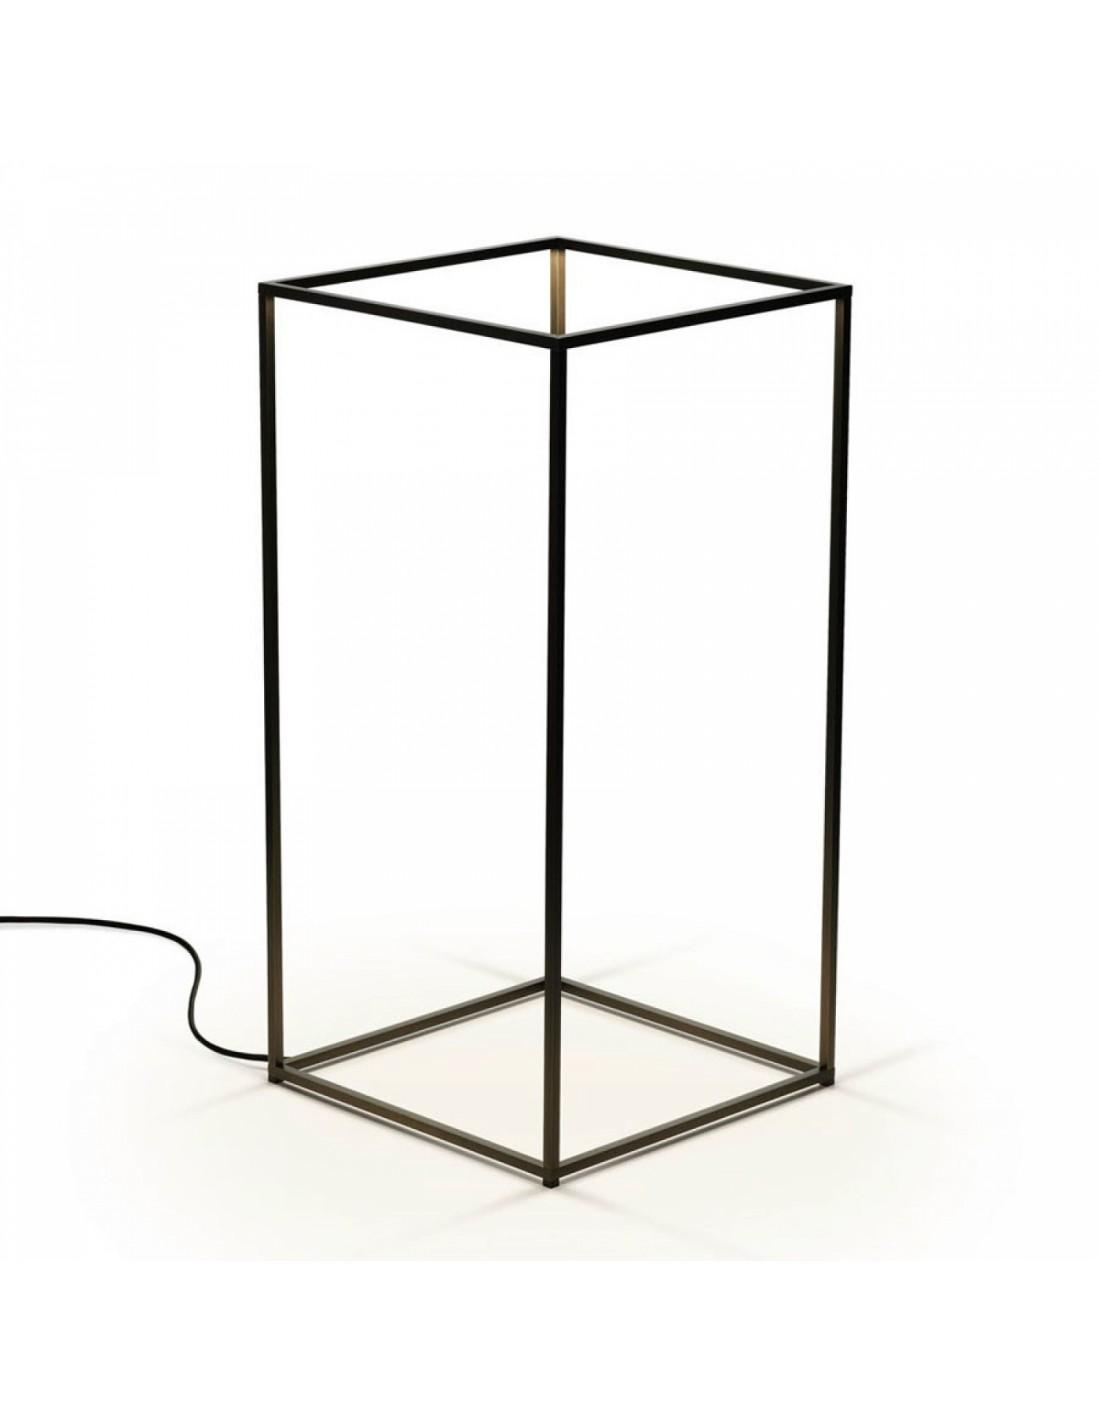 Lampe Ipnos Outdoor anodisé noir de flos